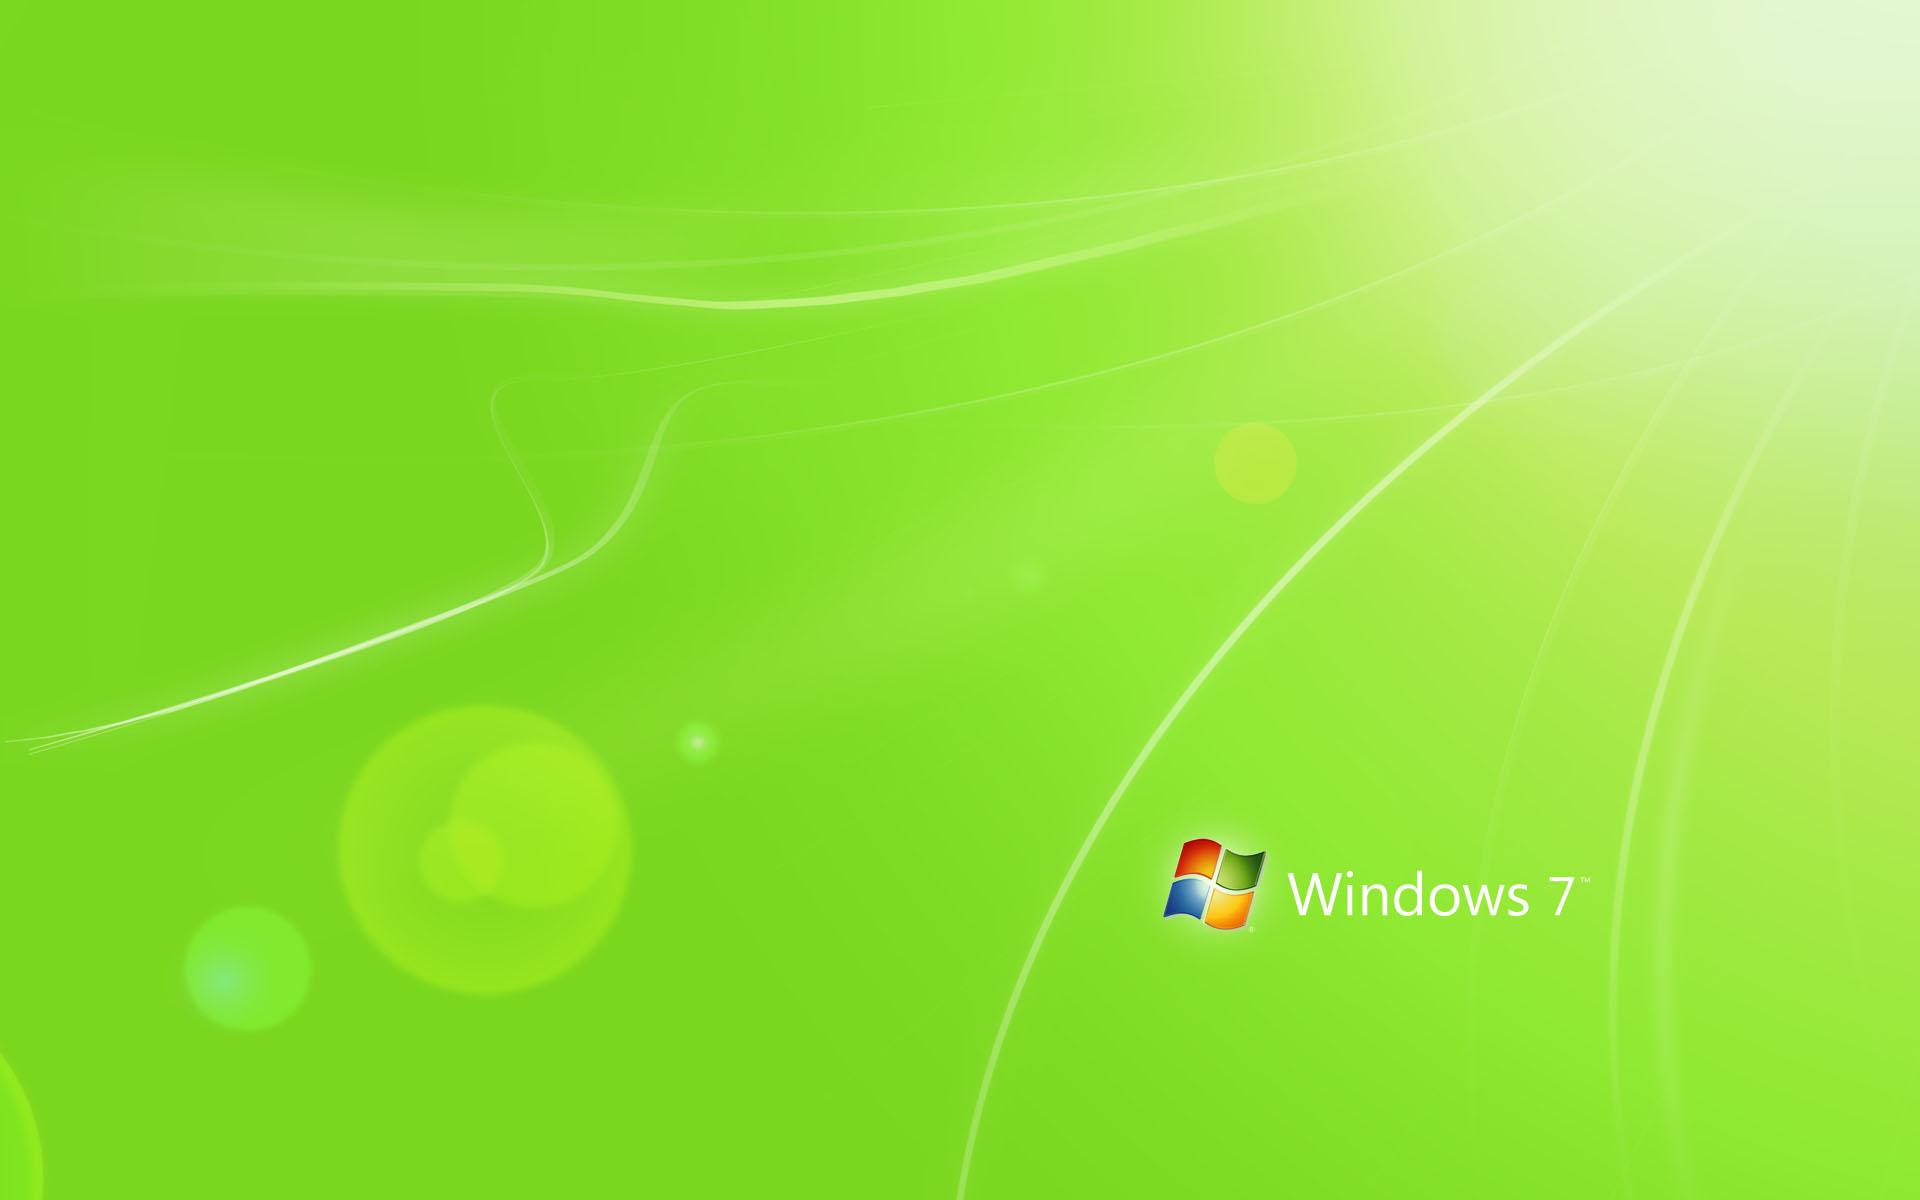 windows 7 green wallpapers 50 wallpapers